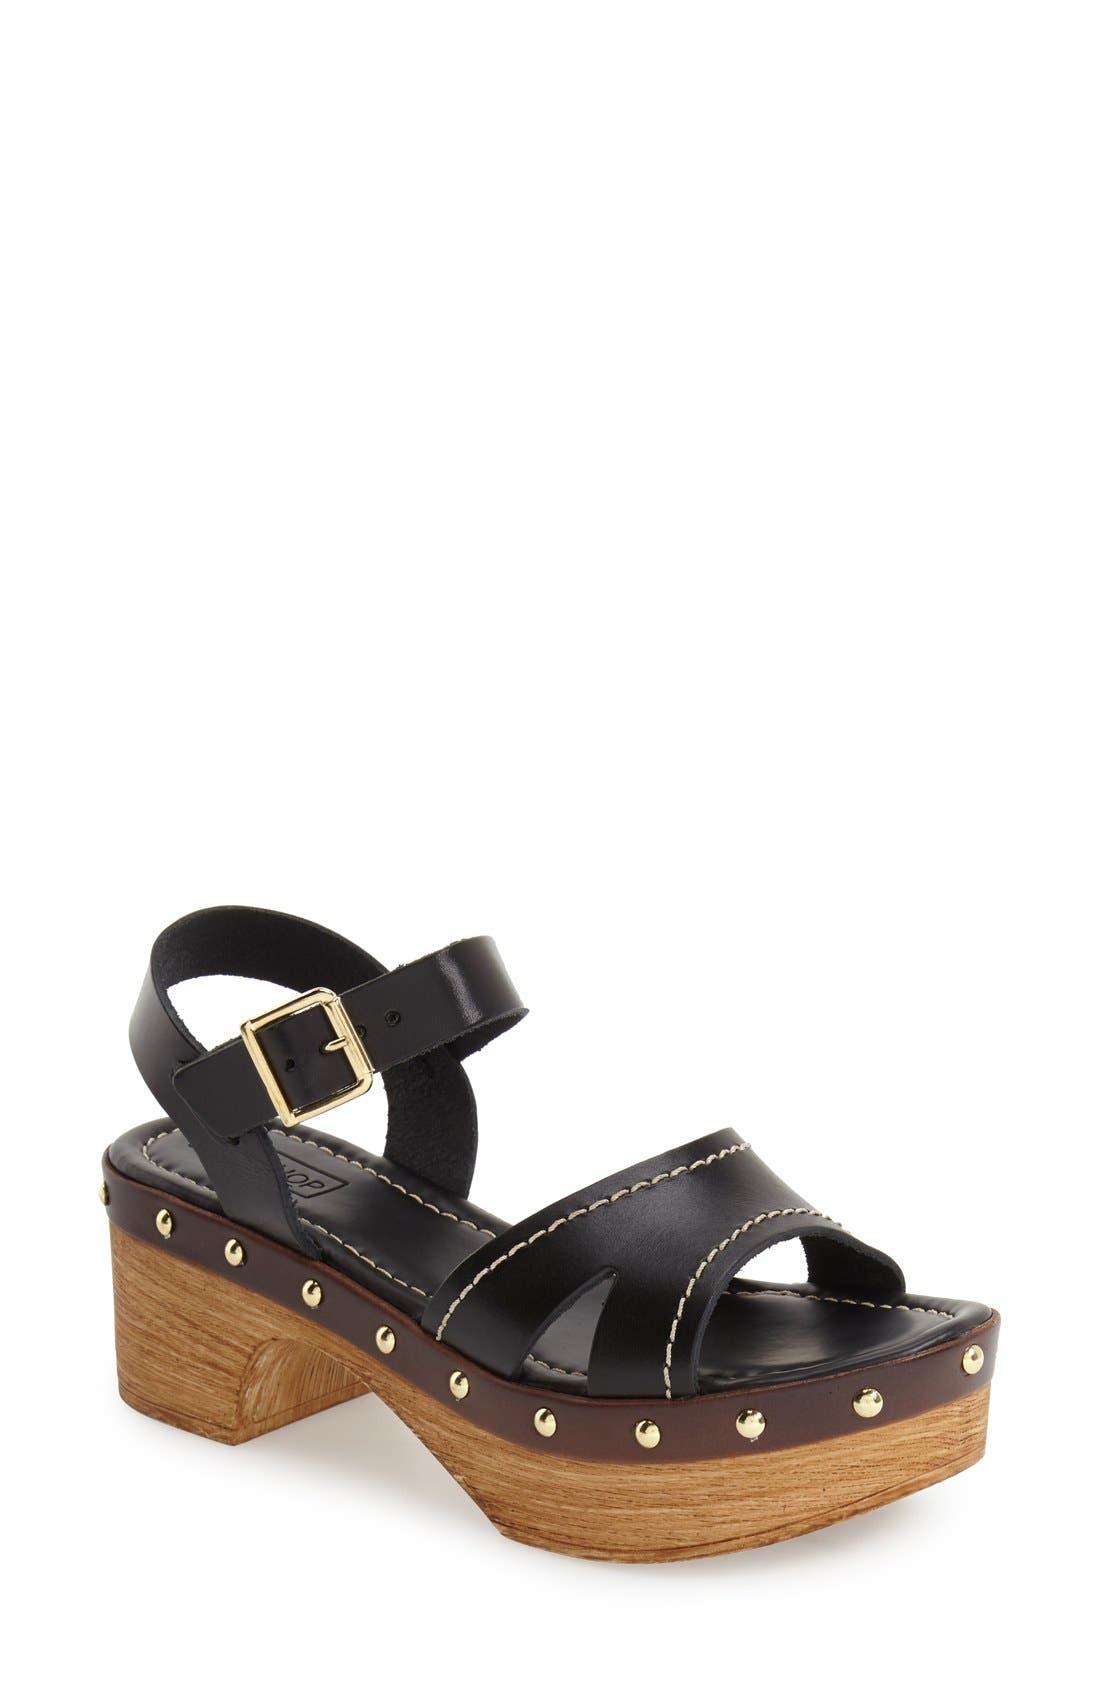 'VIV' Clog Sandals,                         Main,                         color, Black